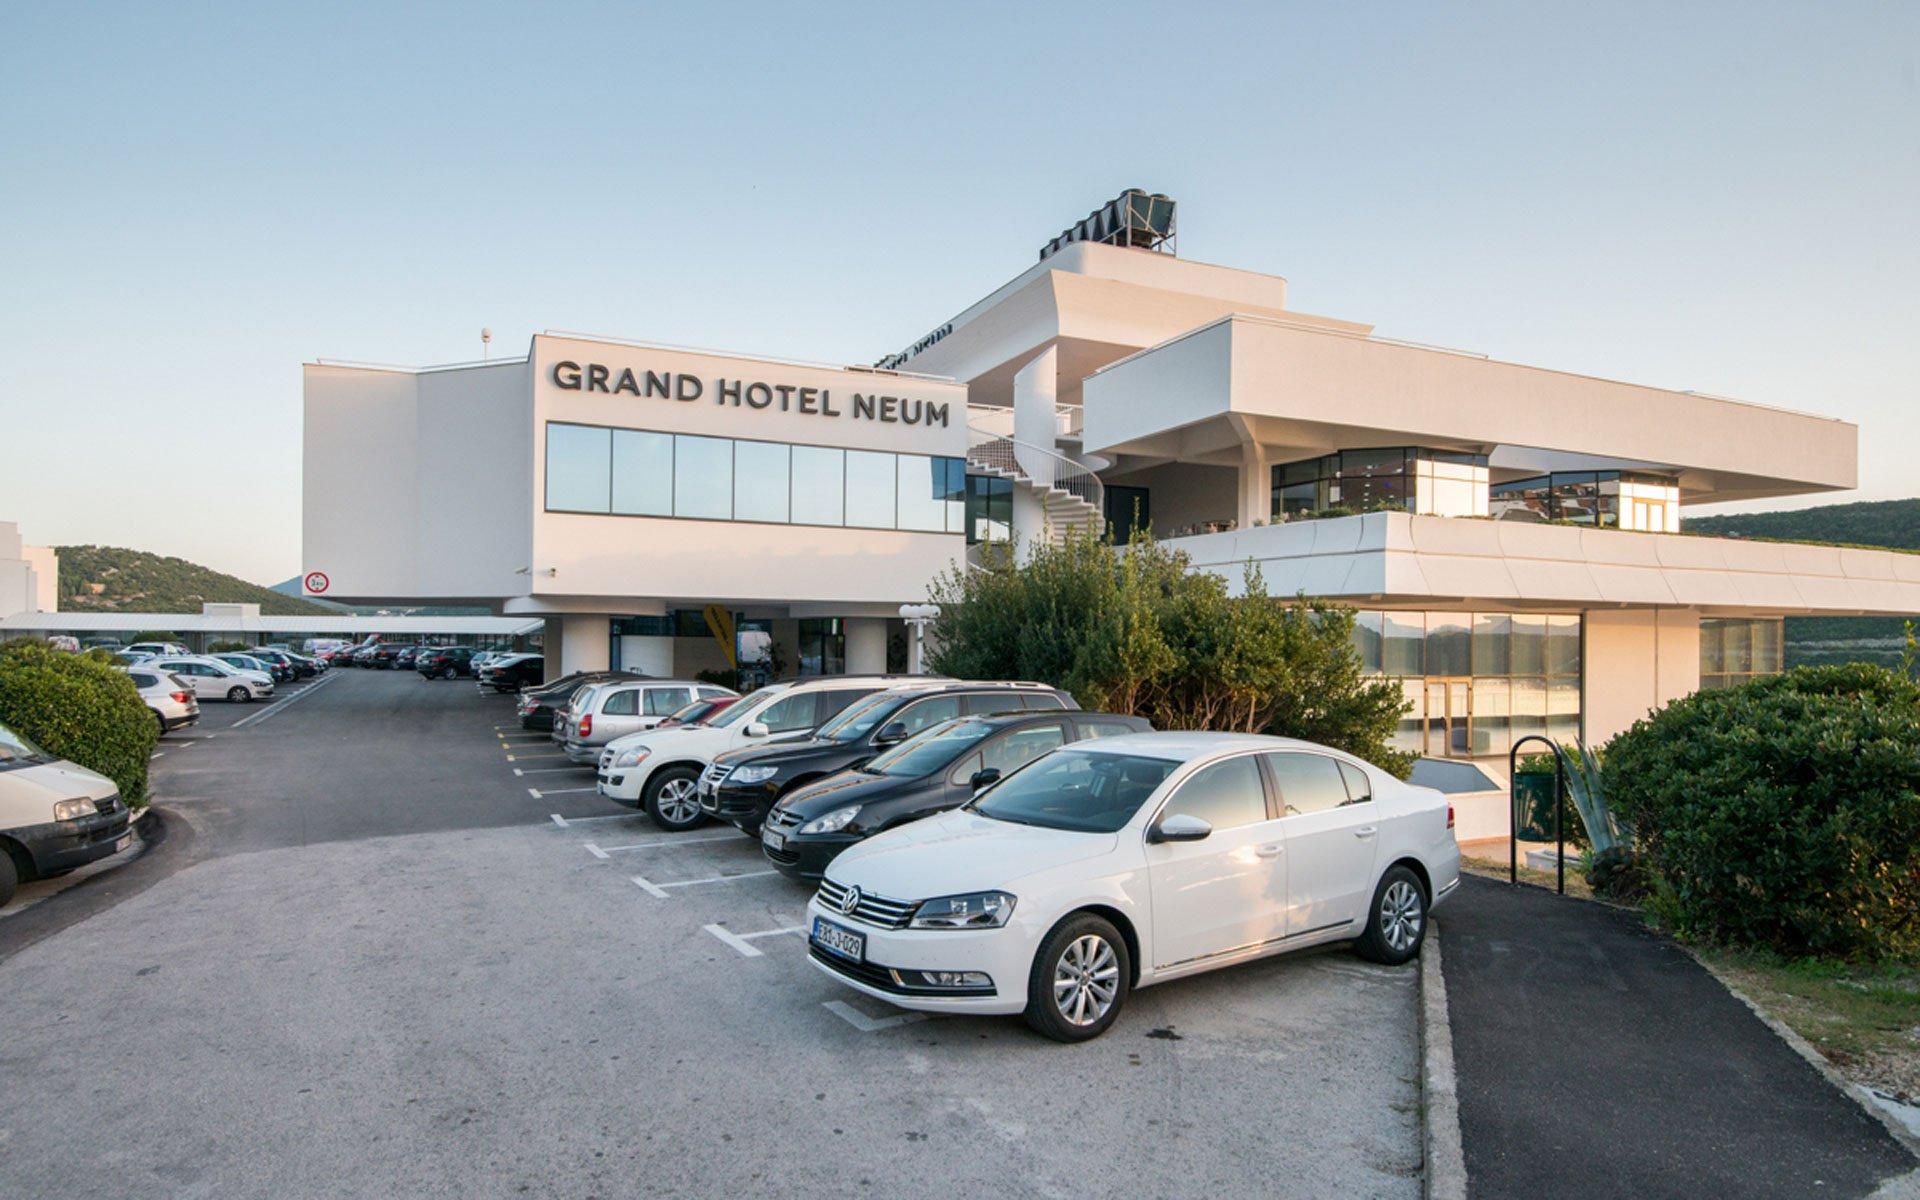 Grand Hotel Neum 24